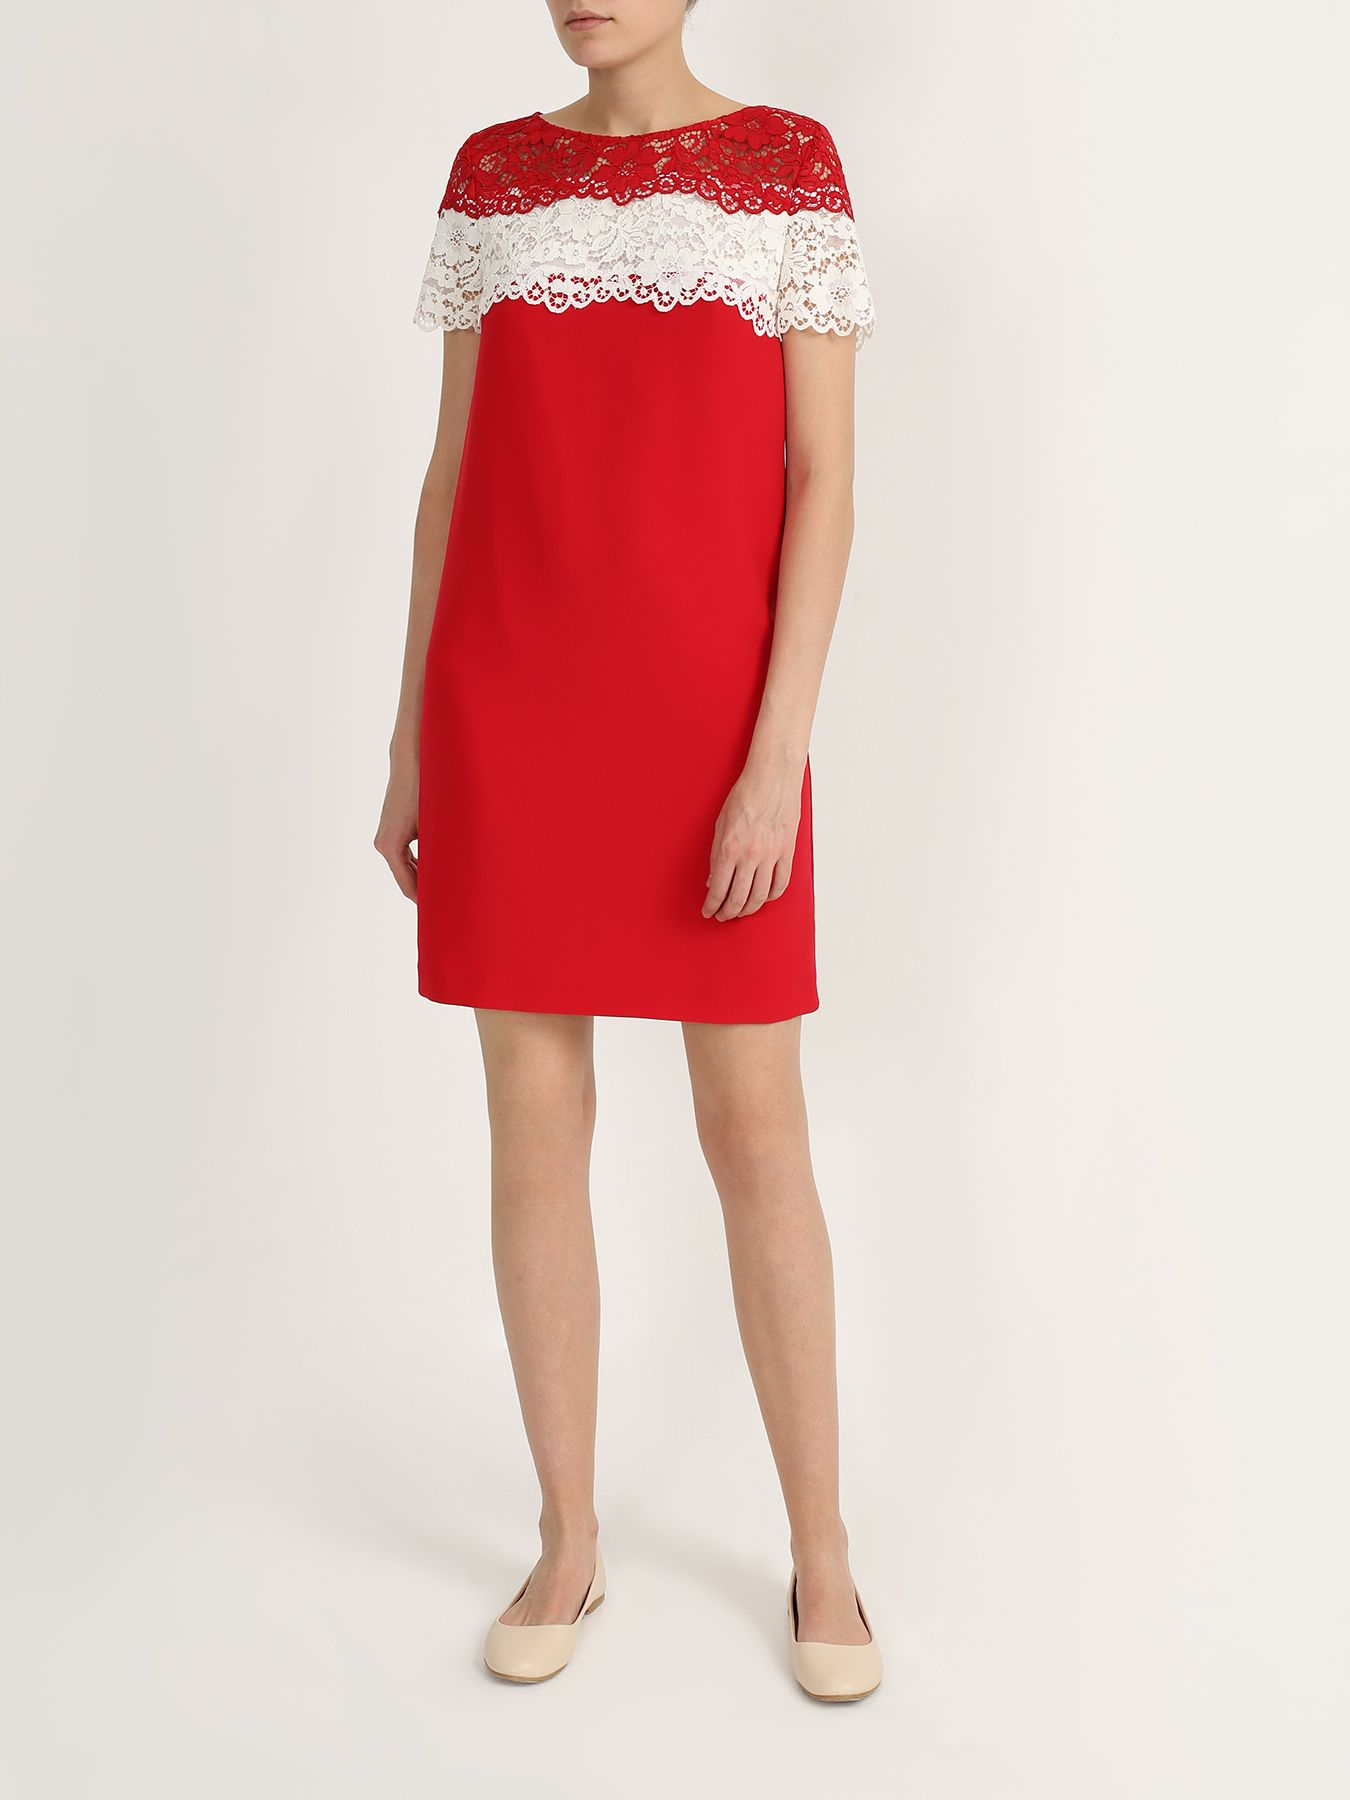 Платье Finisterre Платье с кружевом